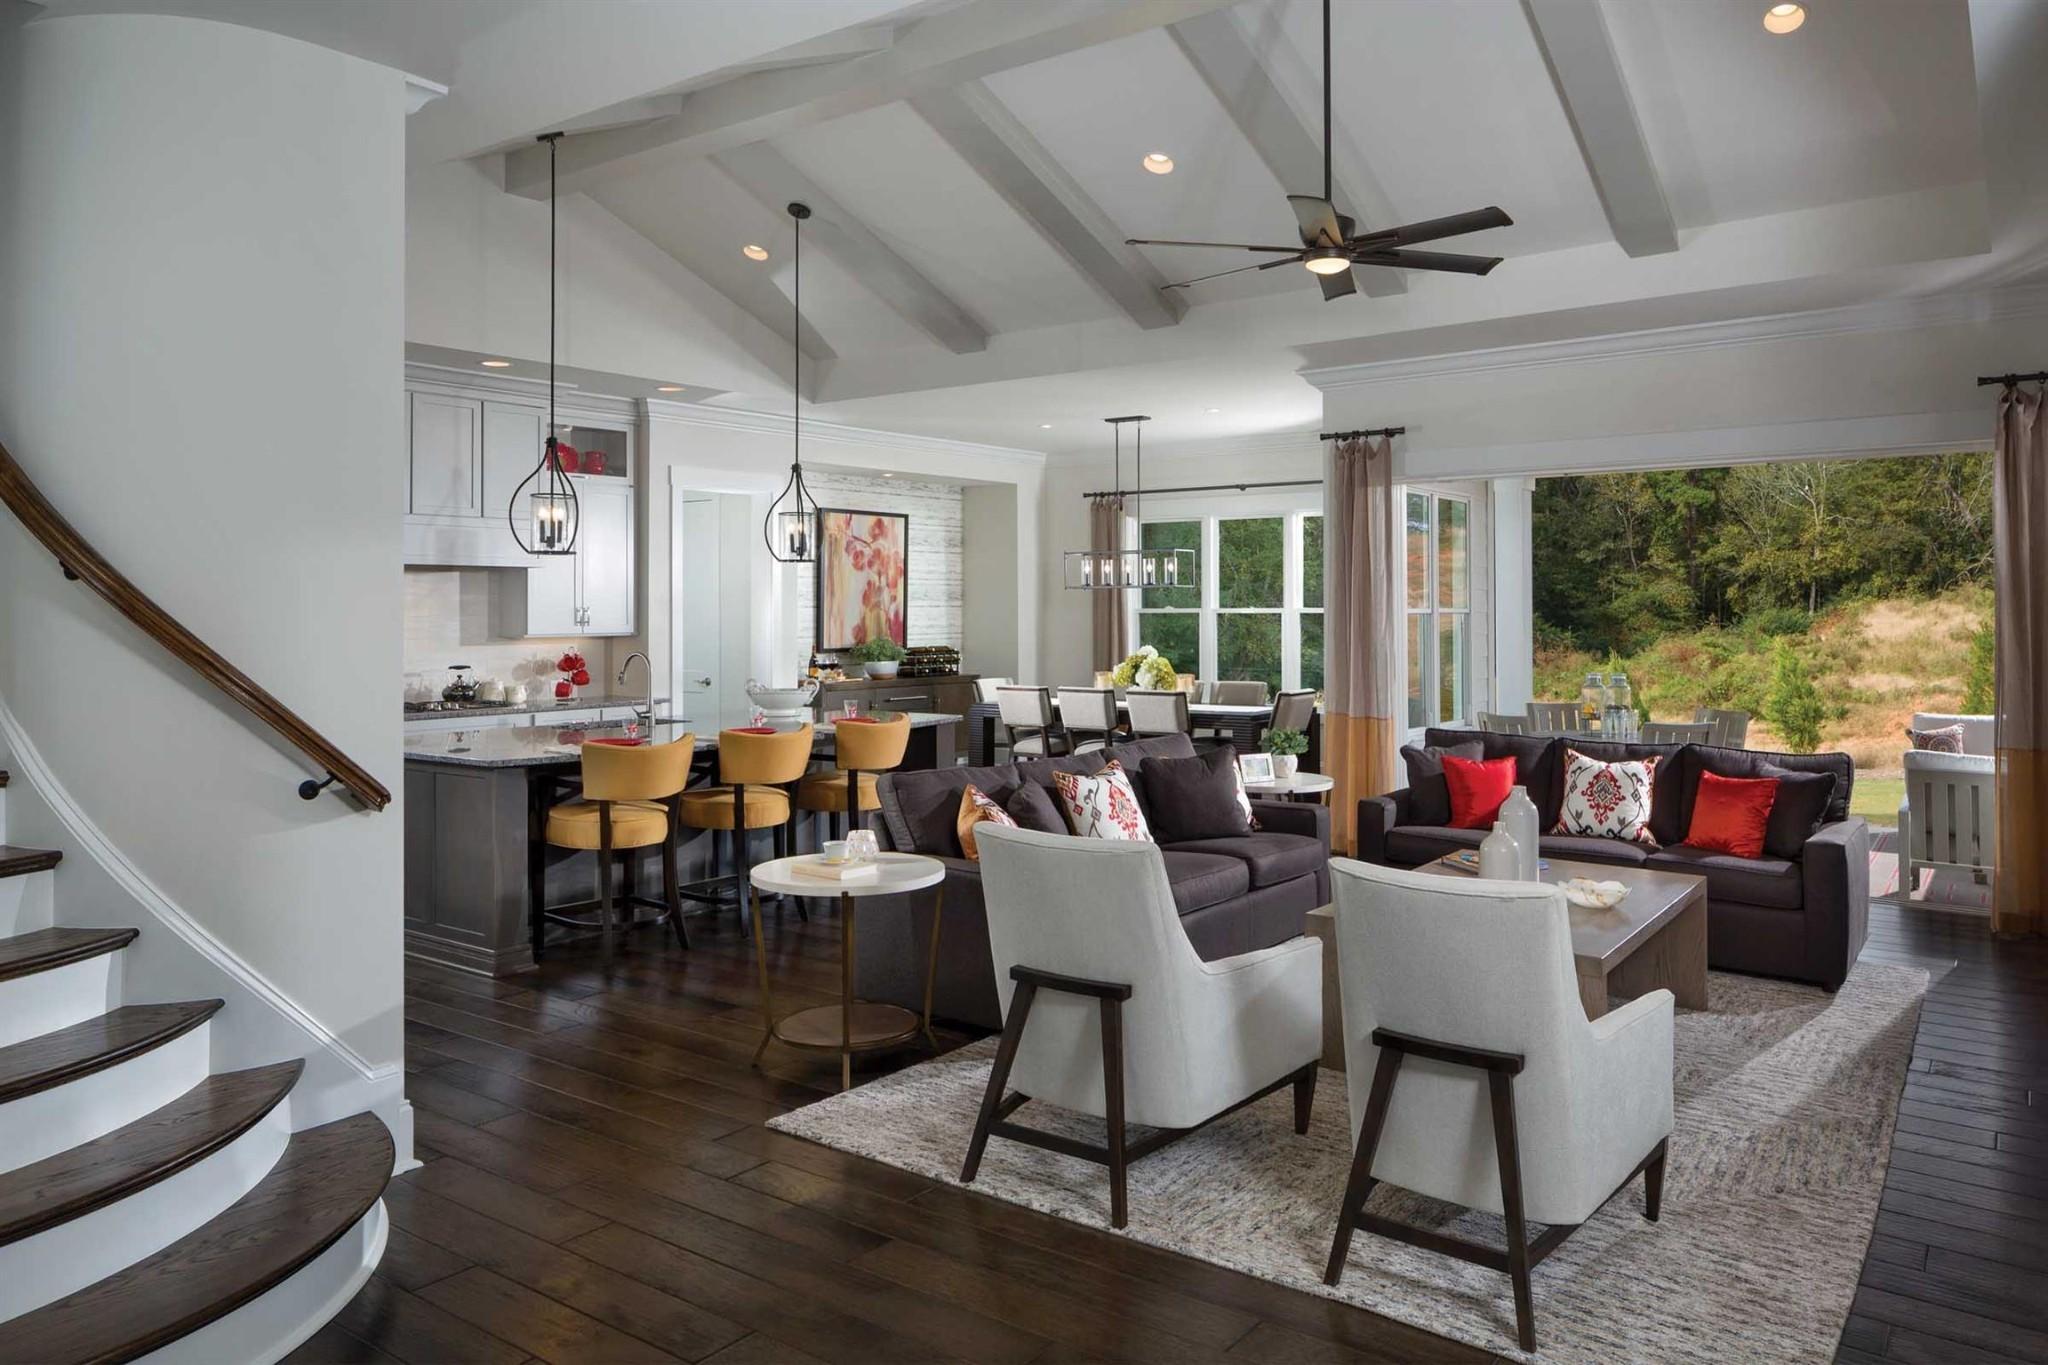 1504 Foxland Blvd, Gallatin, TN 37066 - Gallatin, TN real estate listing